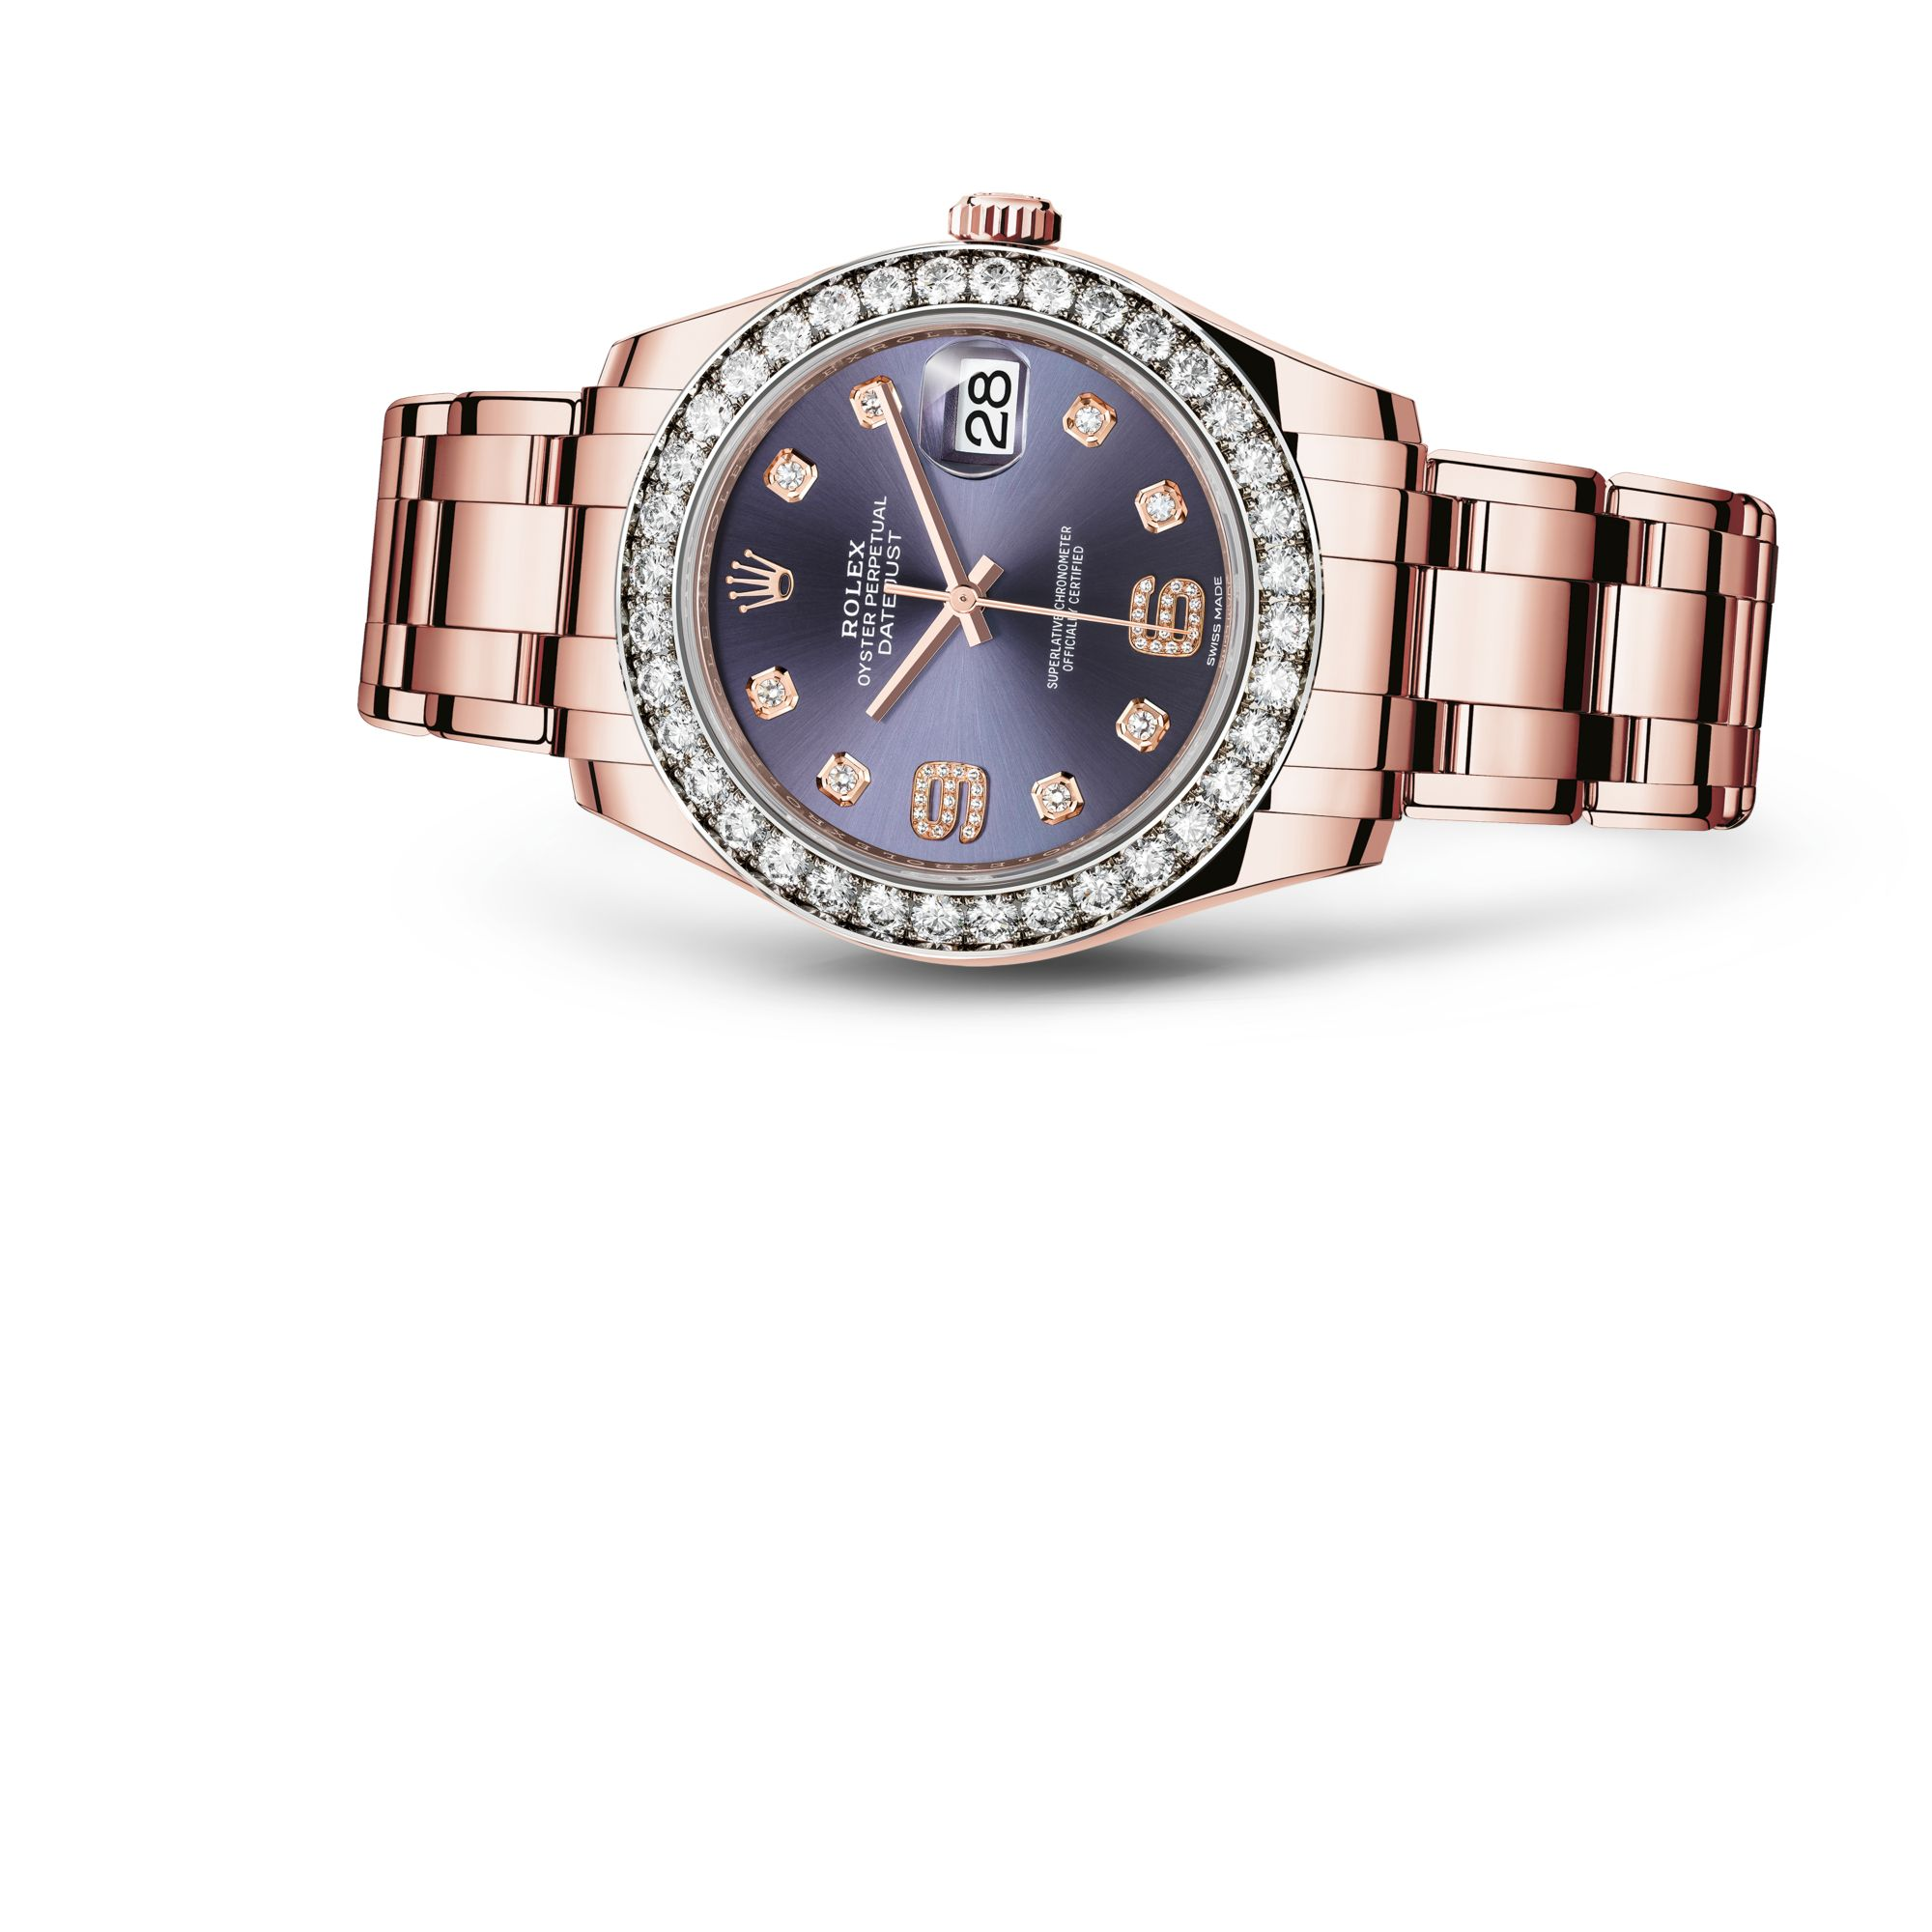 Rolex Pearlmaster 39 M86285-0004